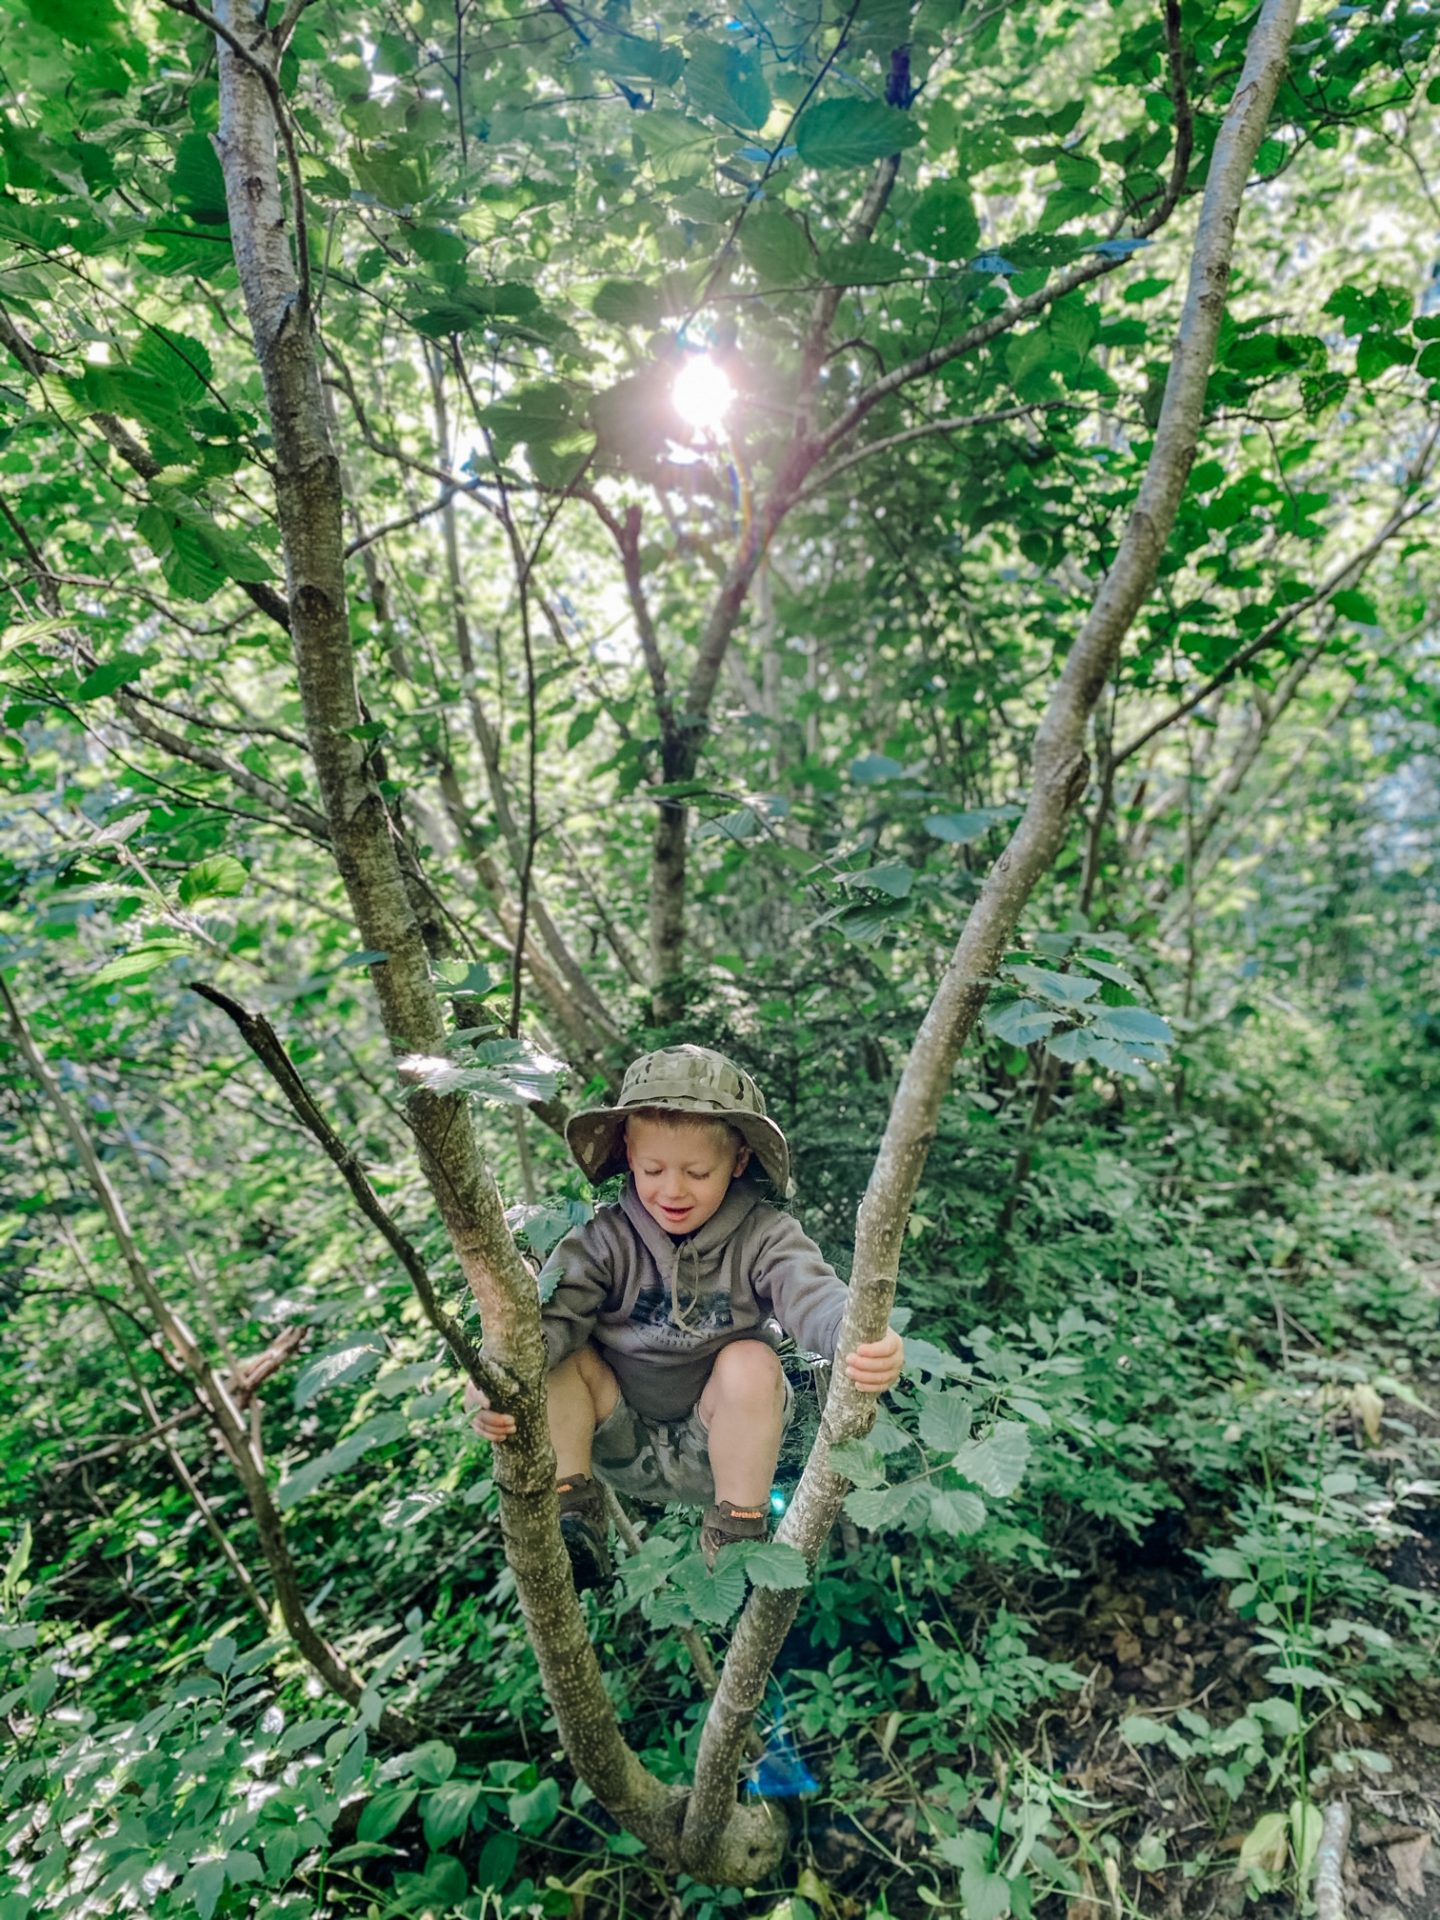 mt. rainier kid-friendly hikes